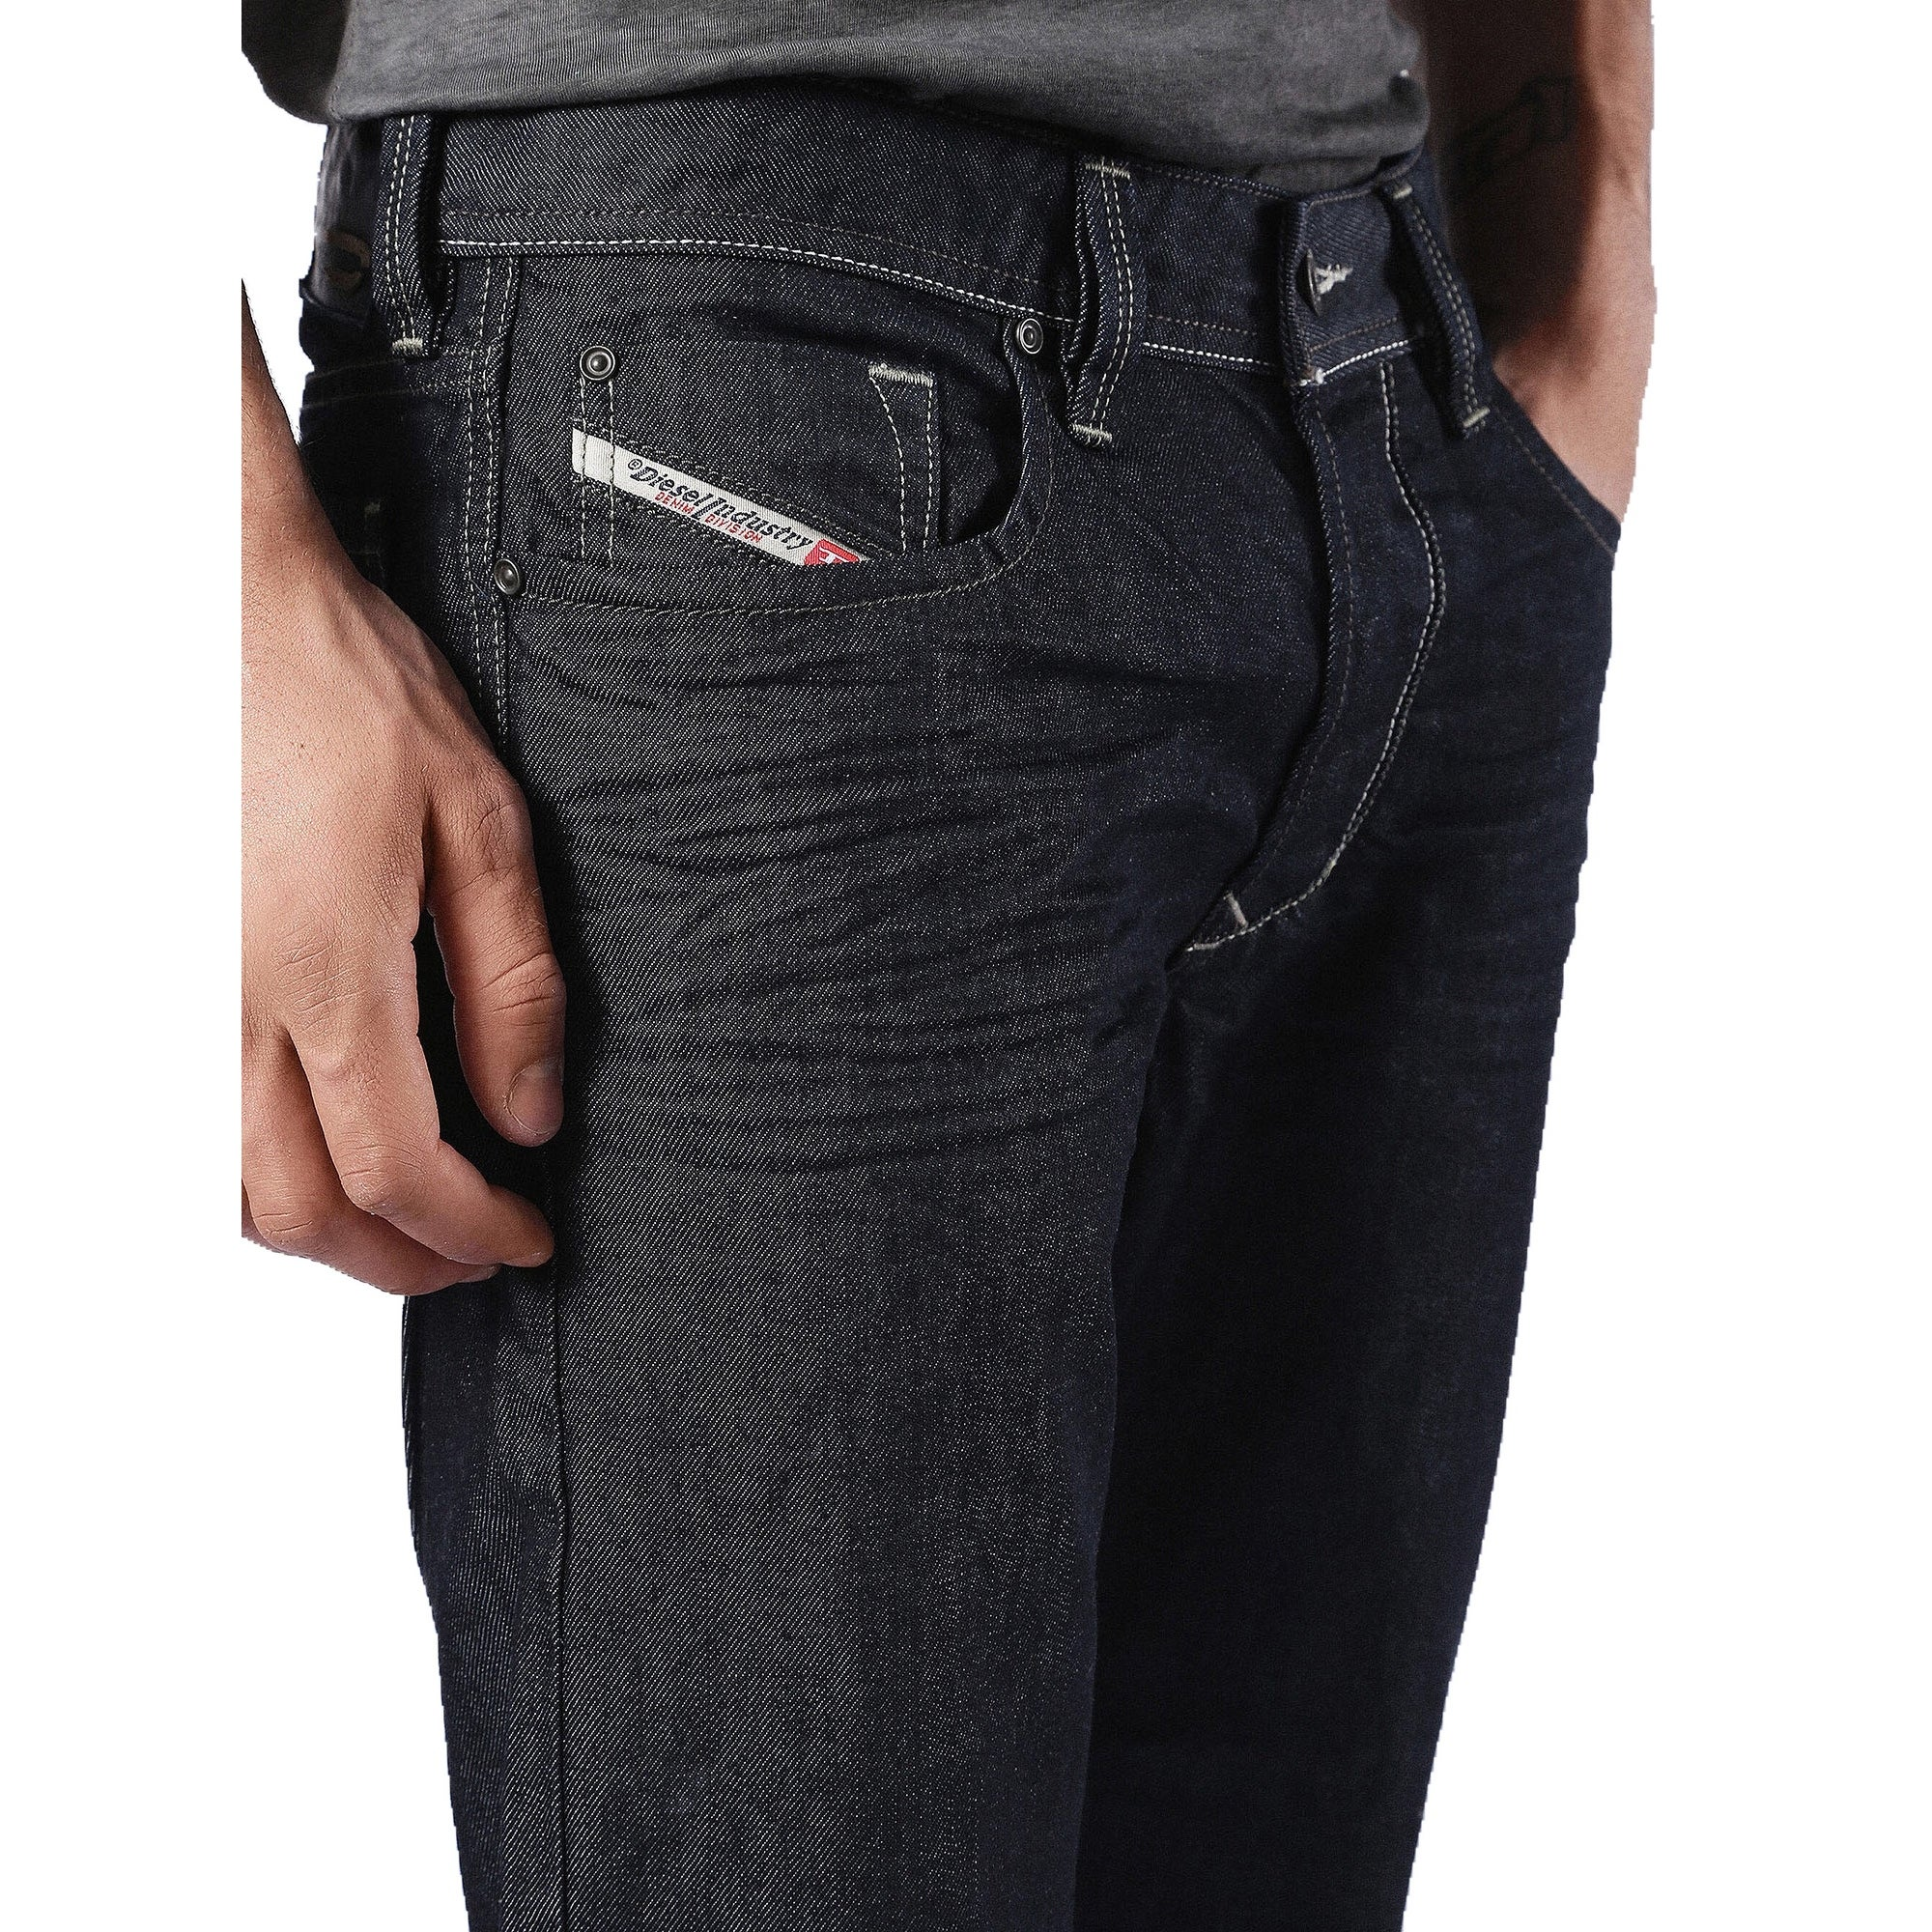 eb7addd5 Shop Diesel Men's Larkee Relaxed Regular Straight-Leg Denim Jean 0088Z -  Free Shipping Today - Overstock - 13548692